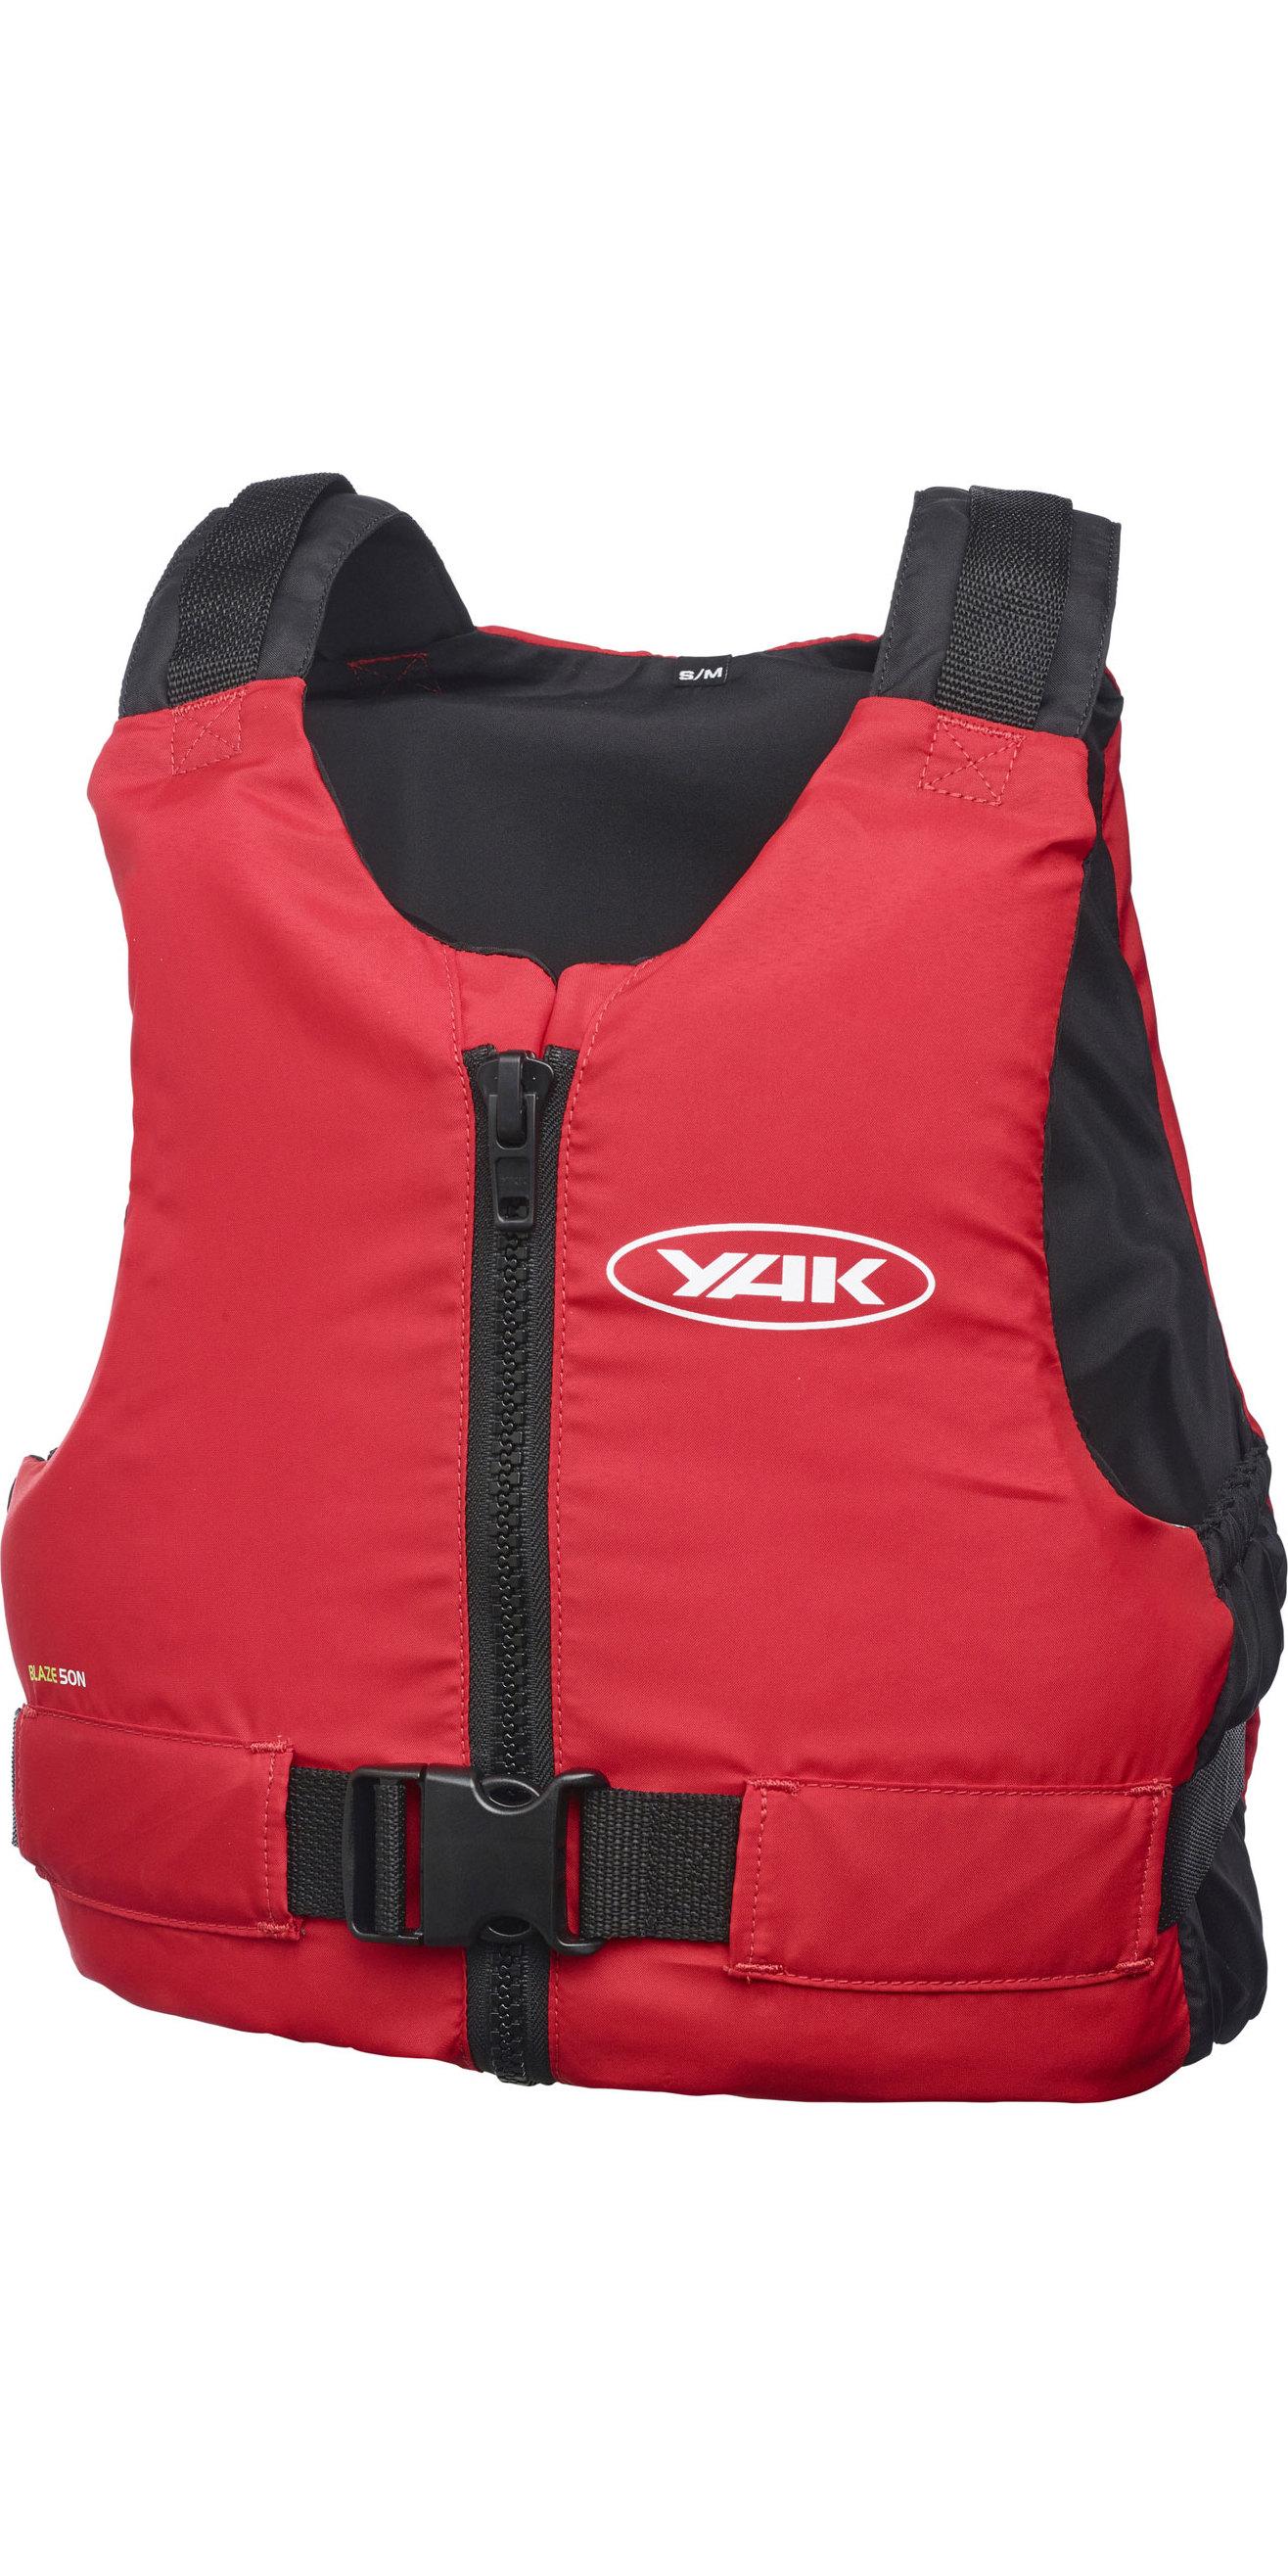 2020 Yak Blaze Kayak 50n Ayuda A La Flotabilidad Rojo 3712